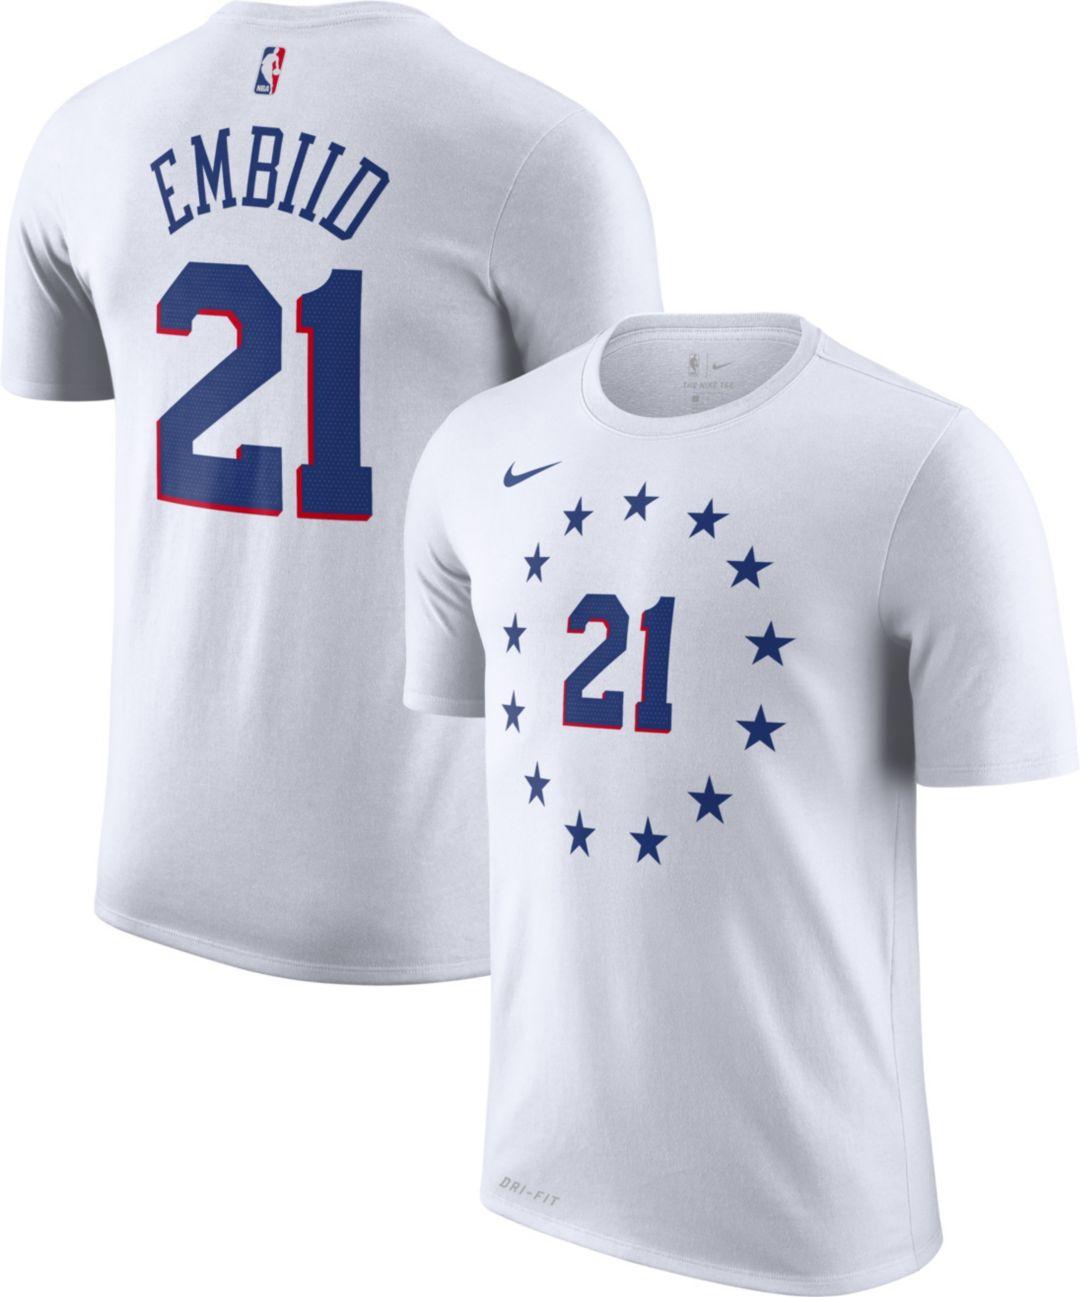 new concept 9f9d5 2982b Nike Men's Philadelphia 76ers Joel Embiid Dri-FIT Earned Edition T-Shirt